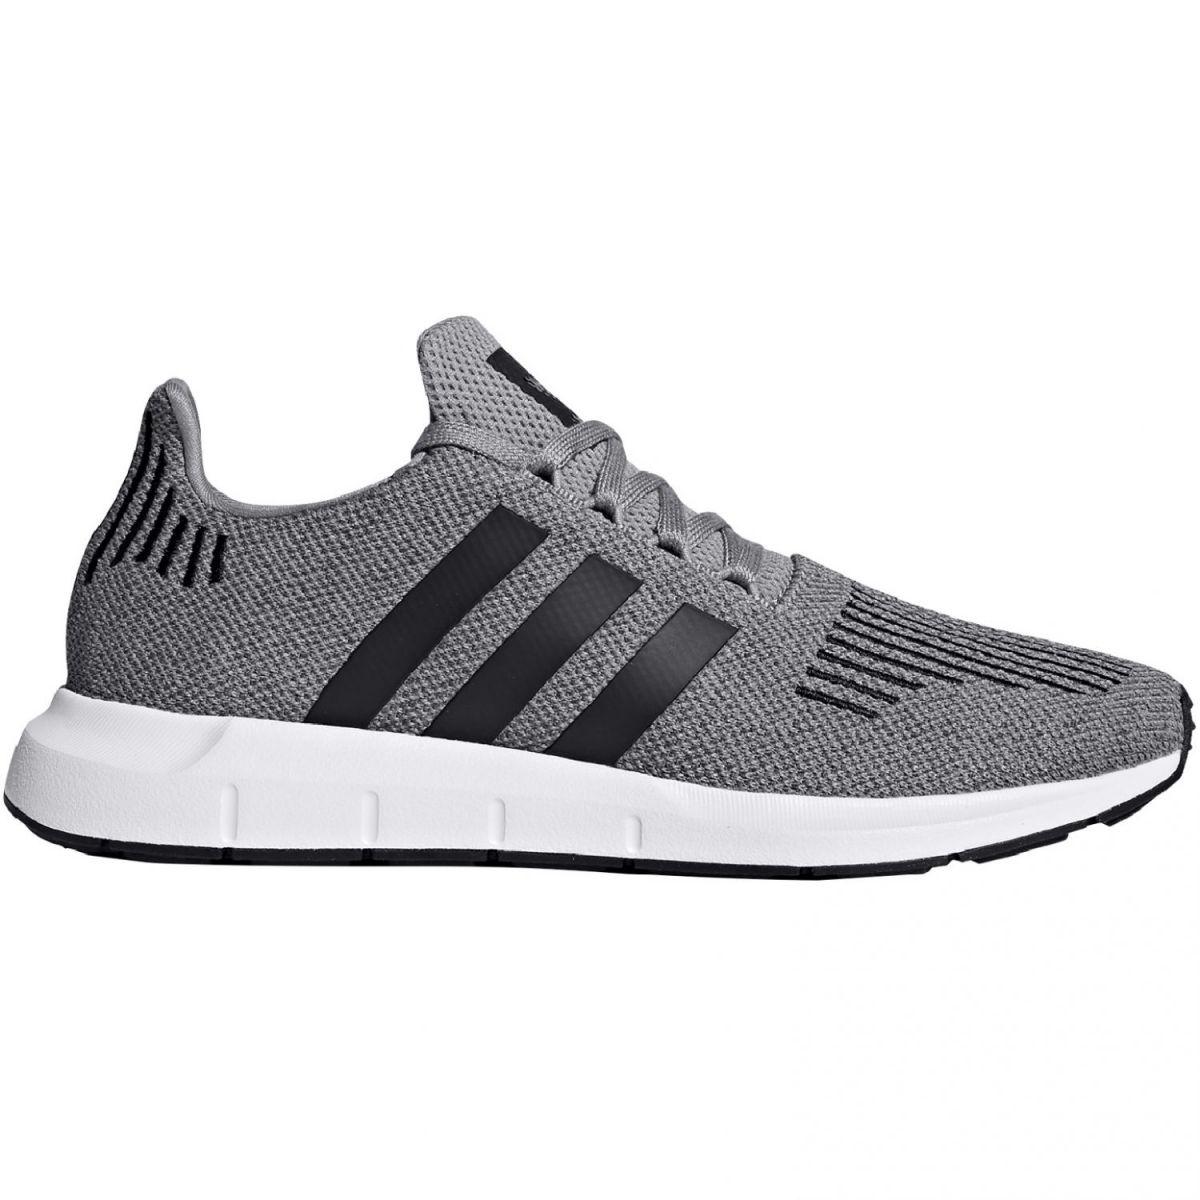 adidas originals swift run herren sneaker schwarz ortholite